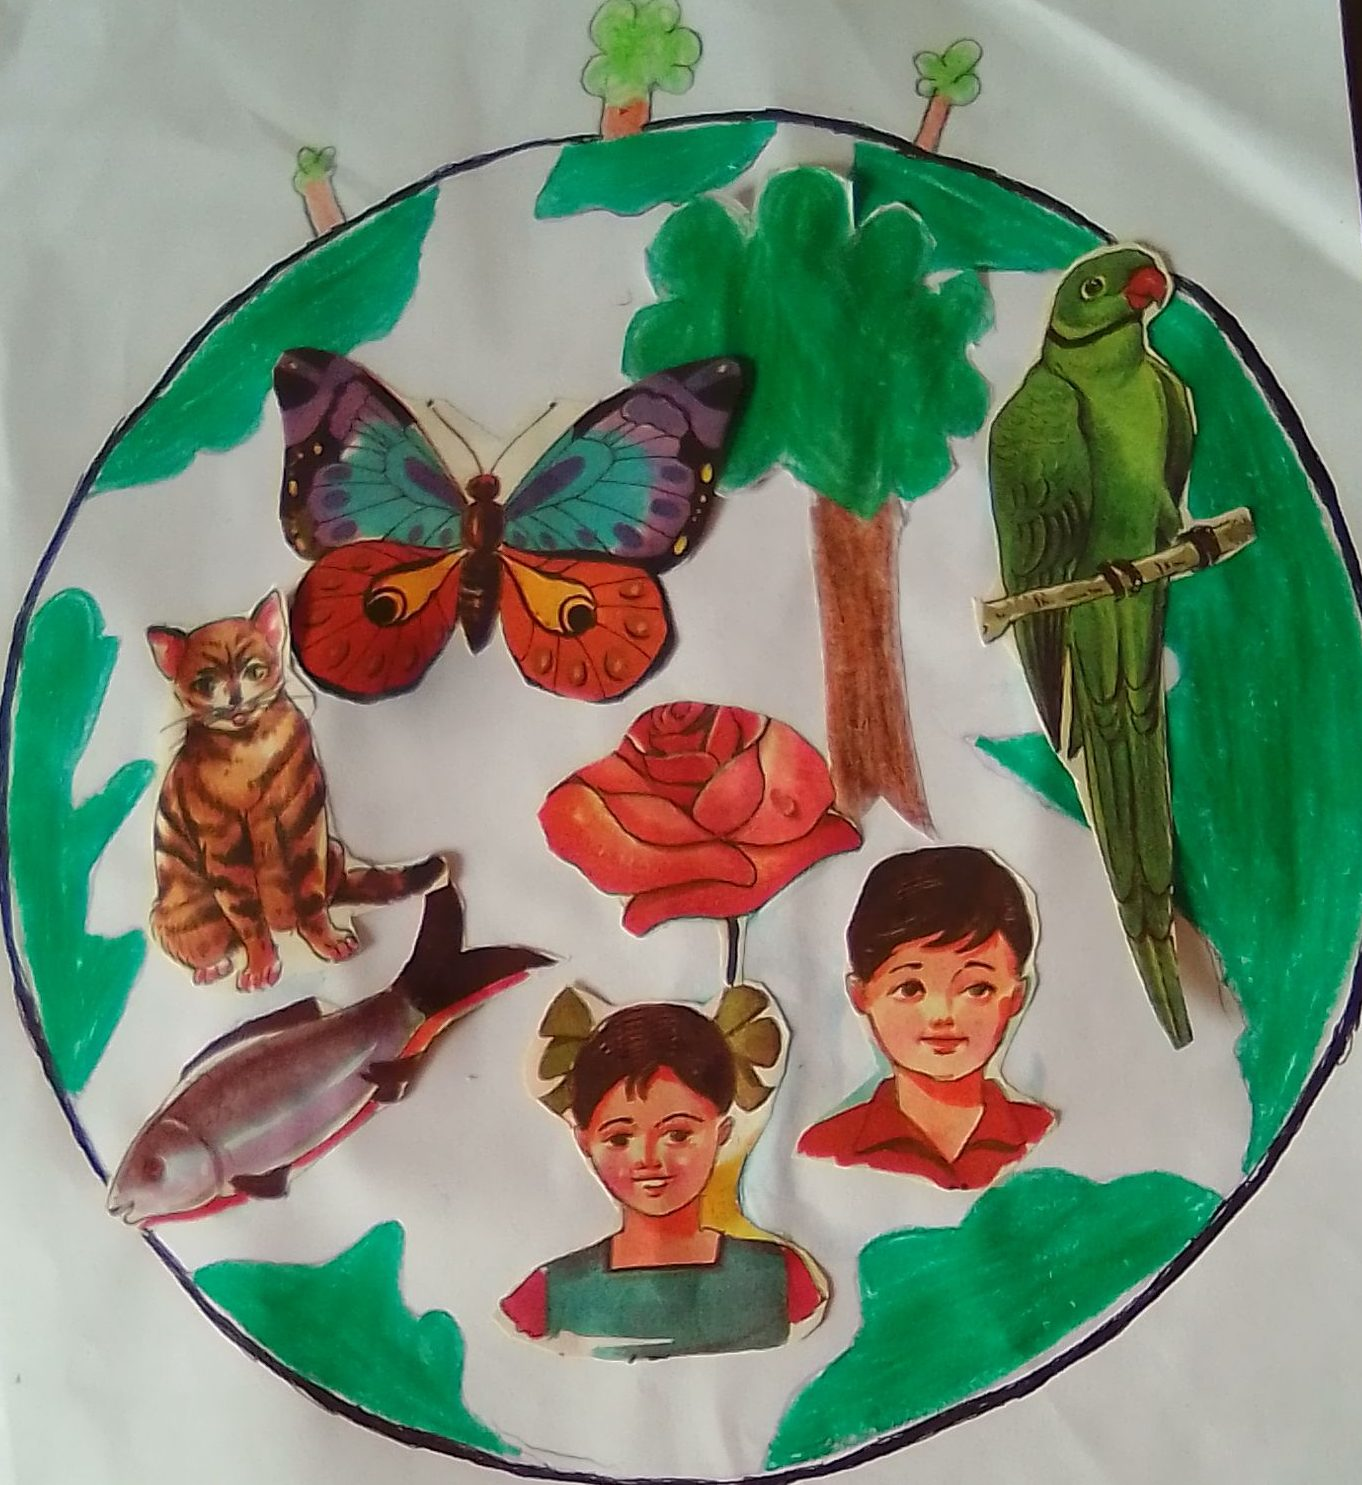 Image depicting biodiversity, art, craft